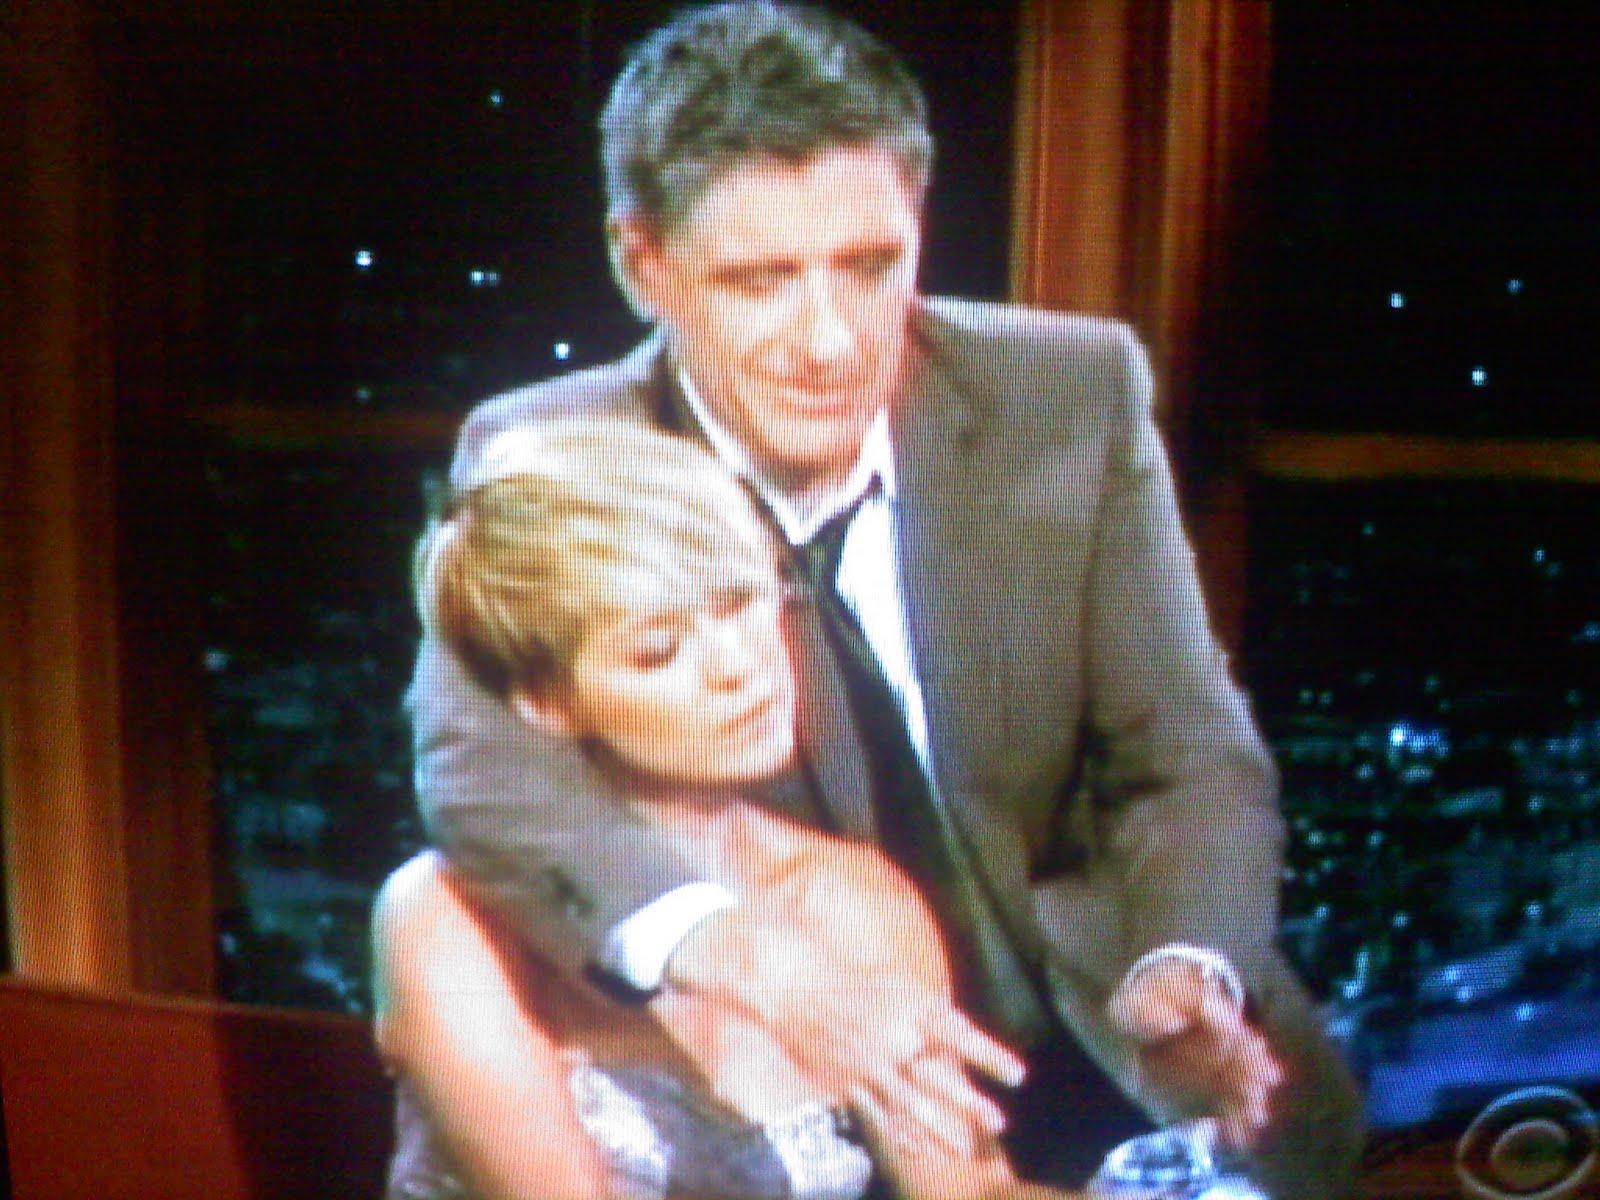 jenna%252Belfman Tags: Actress, actress on bed, BOLLYWOOD HOT, bollywood hot sex scenes, ...